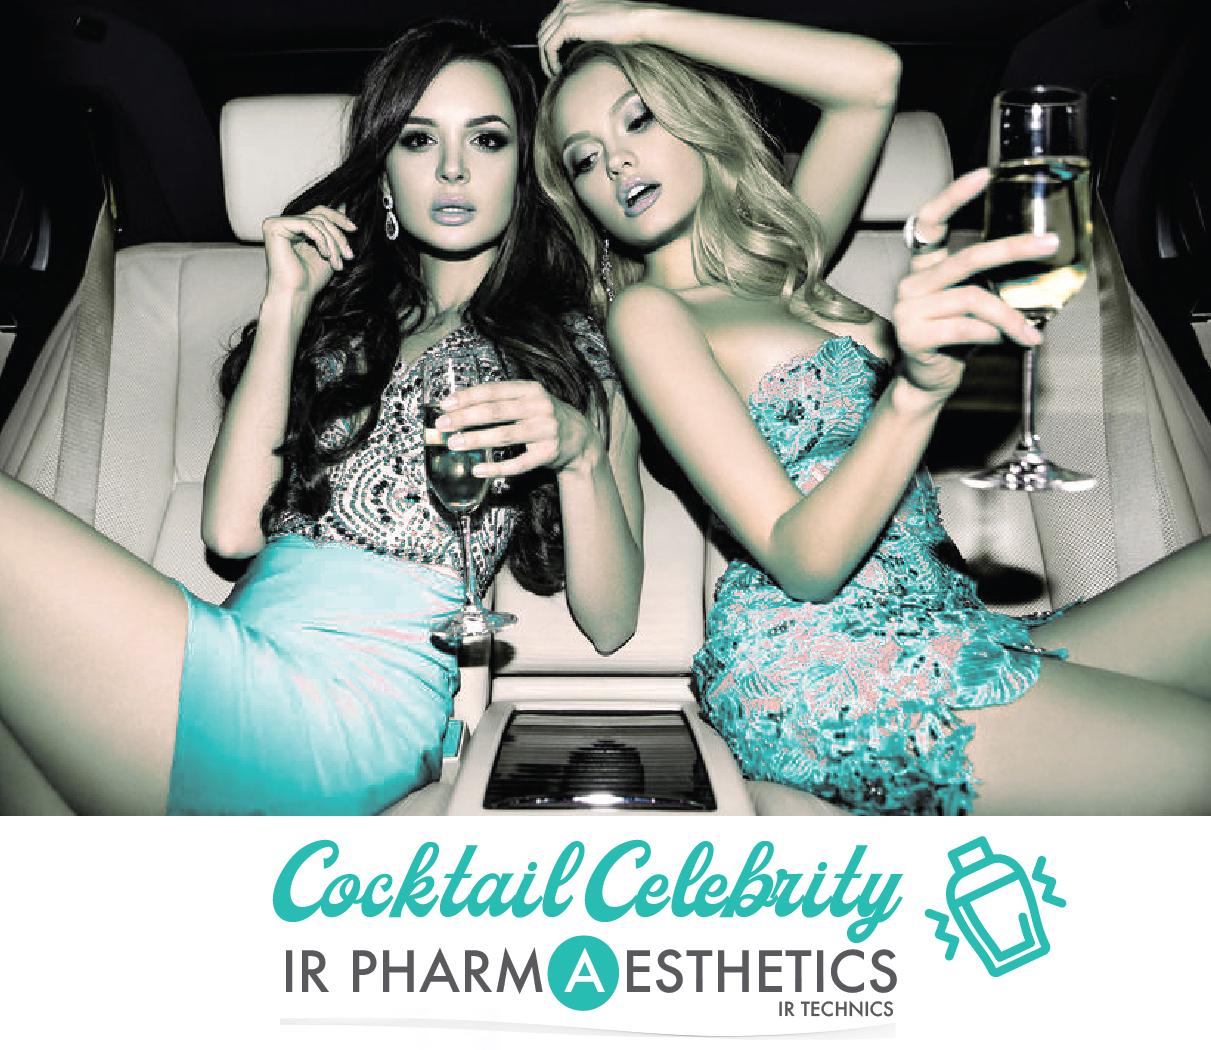 cocktail celebrity